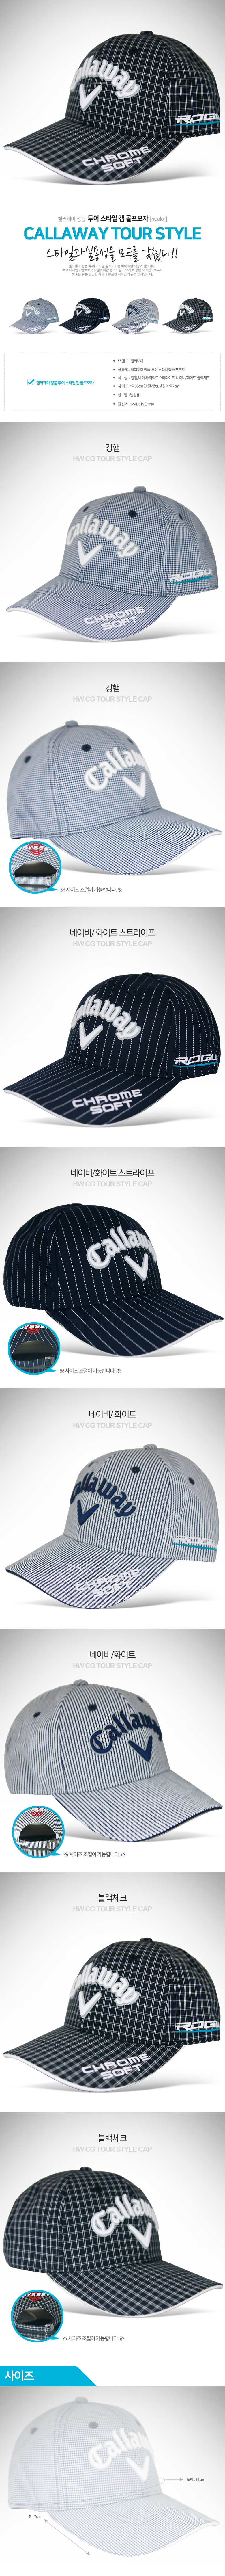 callaway_tour_style_cap.jpg